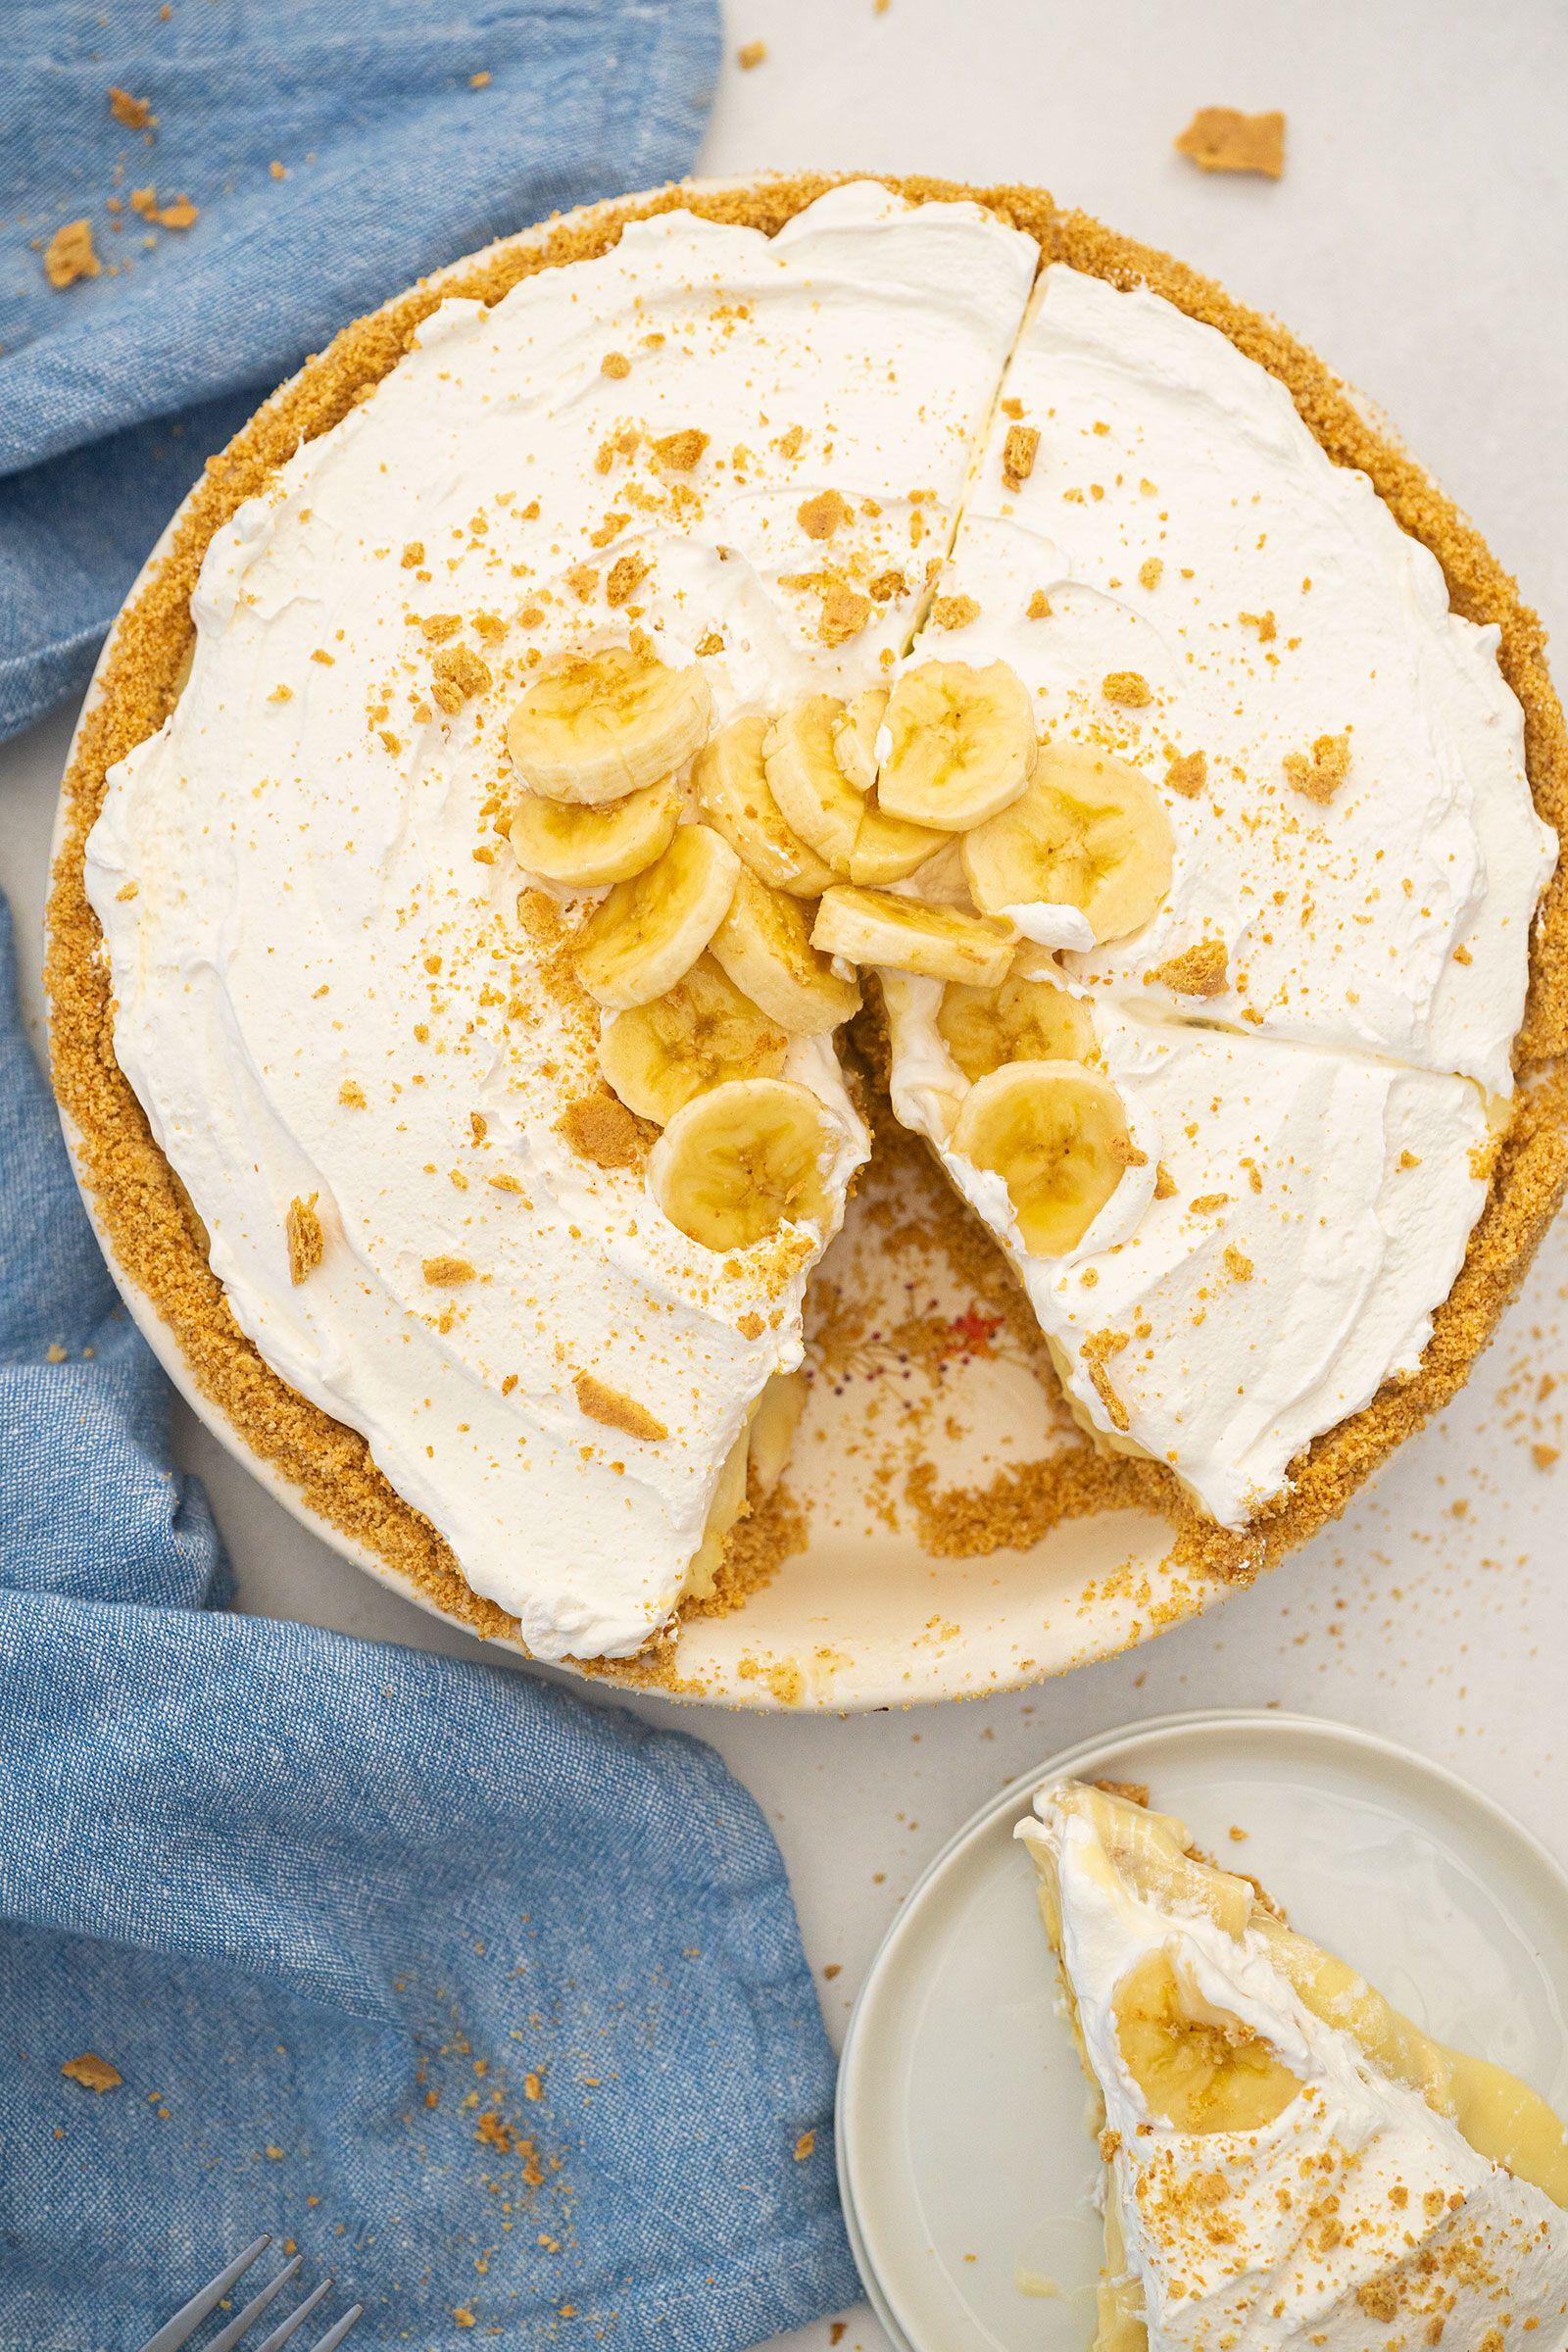 Banana Cream Pie The Kitchen Magpie In 2021 Old Fashioned Banana Cream Pie Recipe Banana Cream Pie Banana Cream Pie Recipe